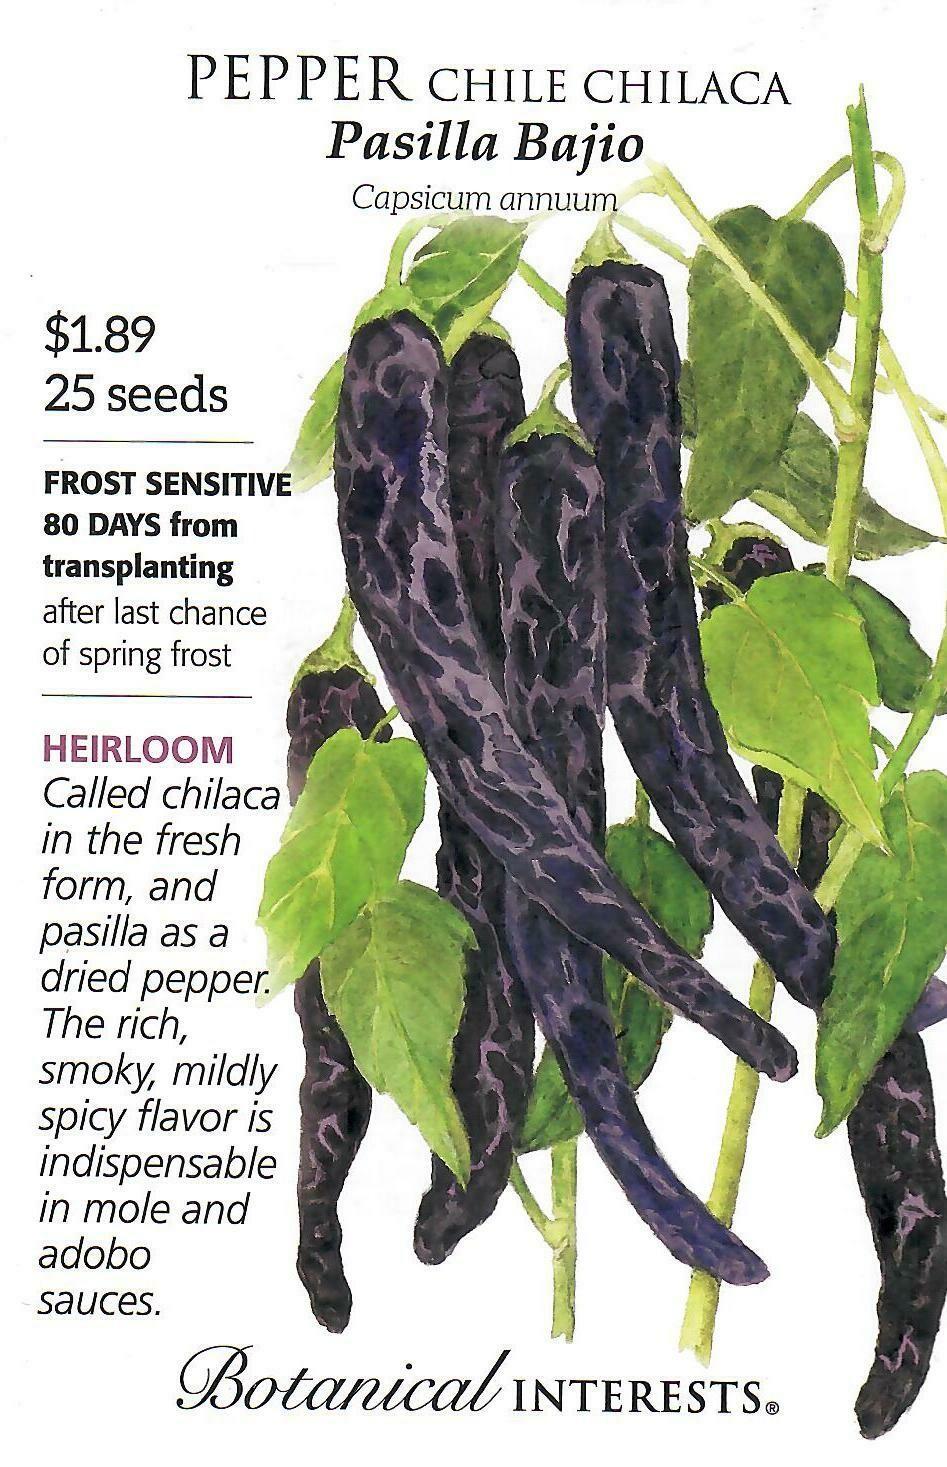 Pepper Chile Chilaca Pasilla Bajio Botanical Interests